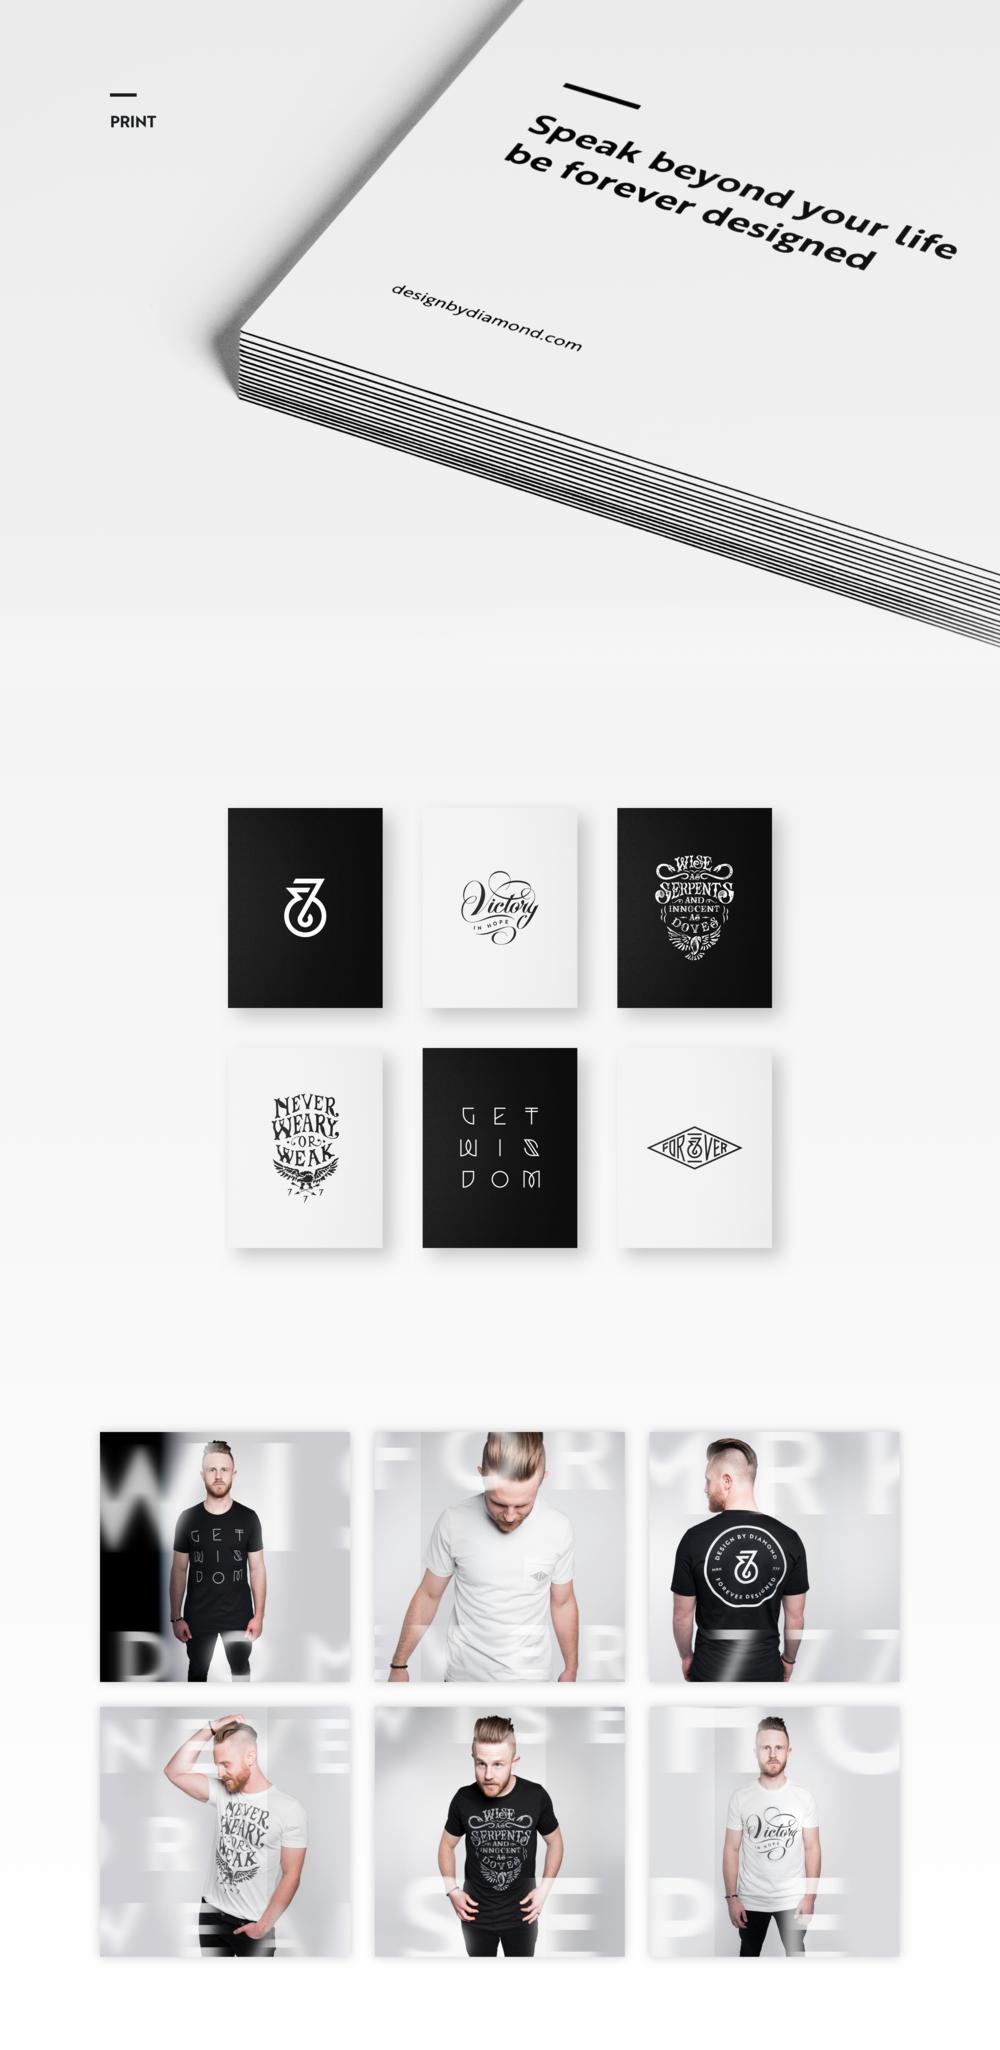 Design-by-diamond - Prints